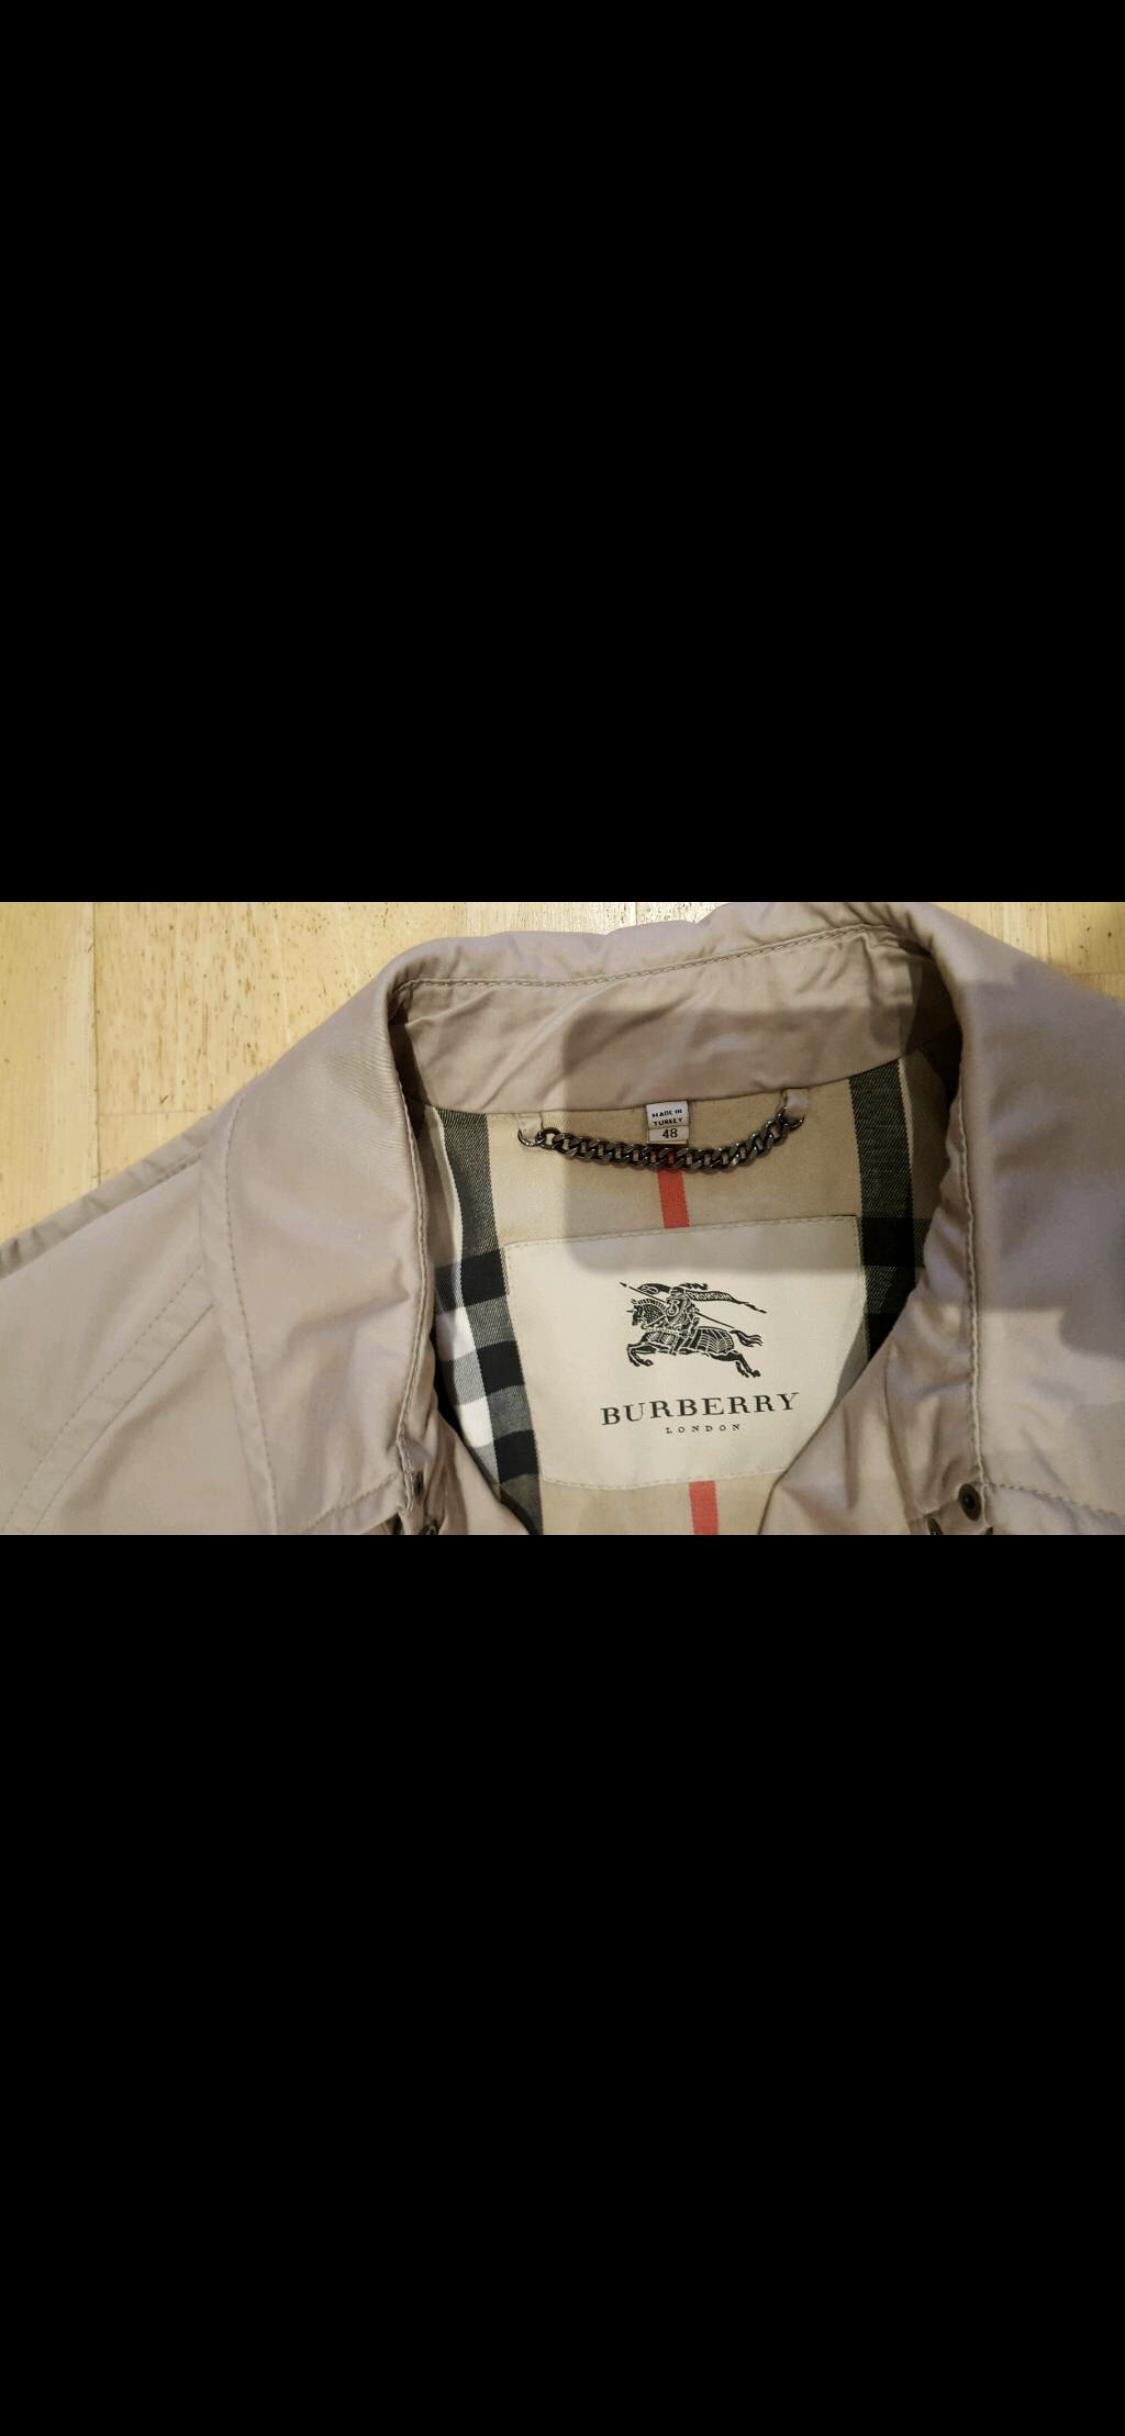 Burberry Trenchcoat Original oder Fake?? (Mode, Plagiat)